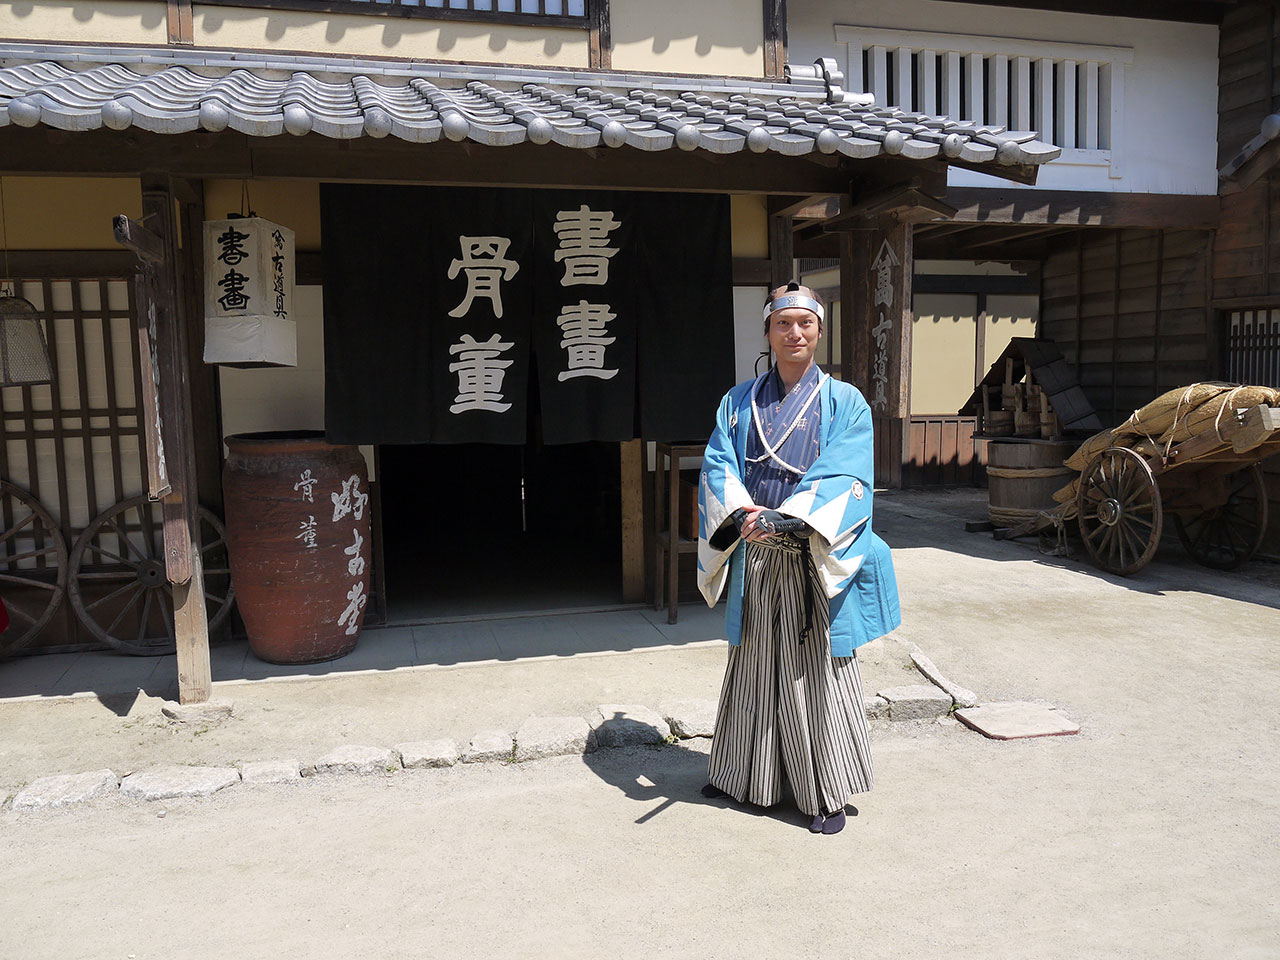 Takahiro Hotta posing on set